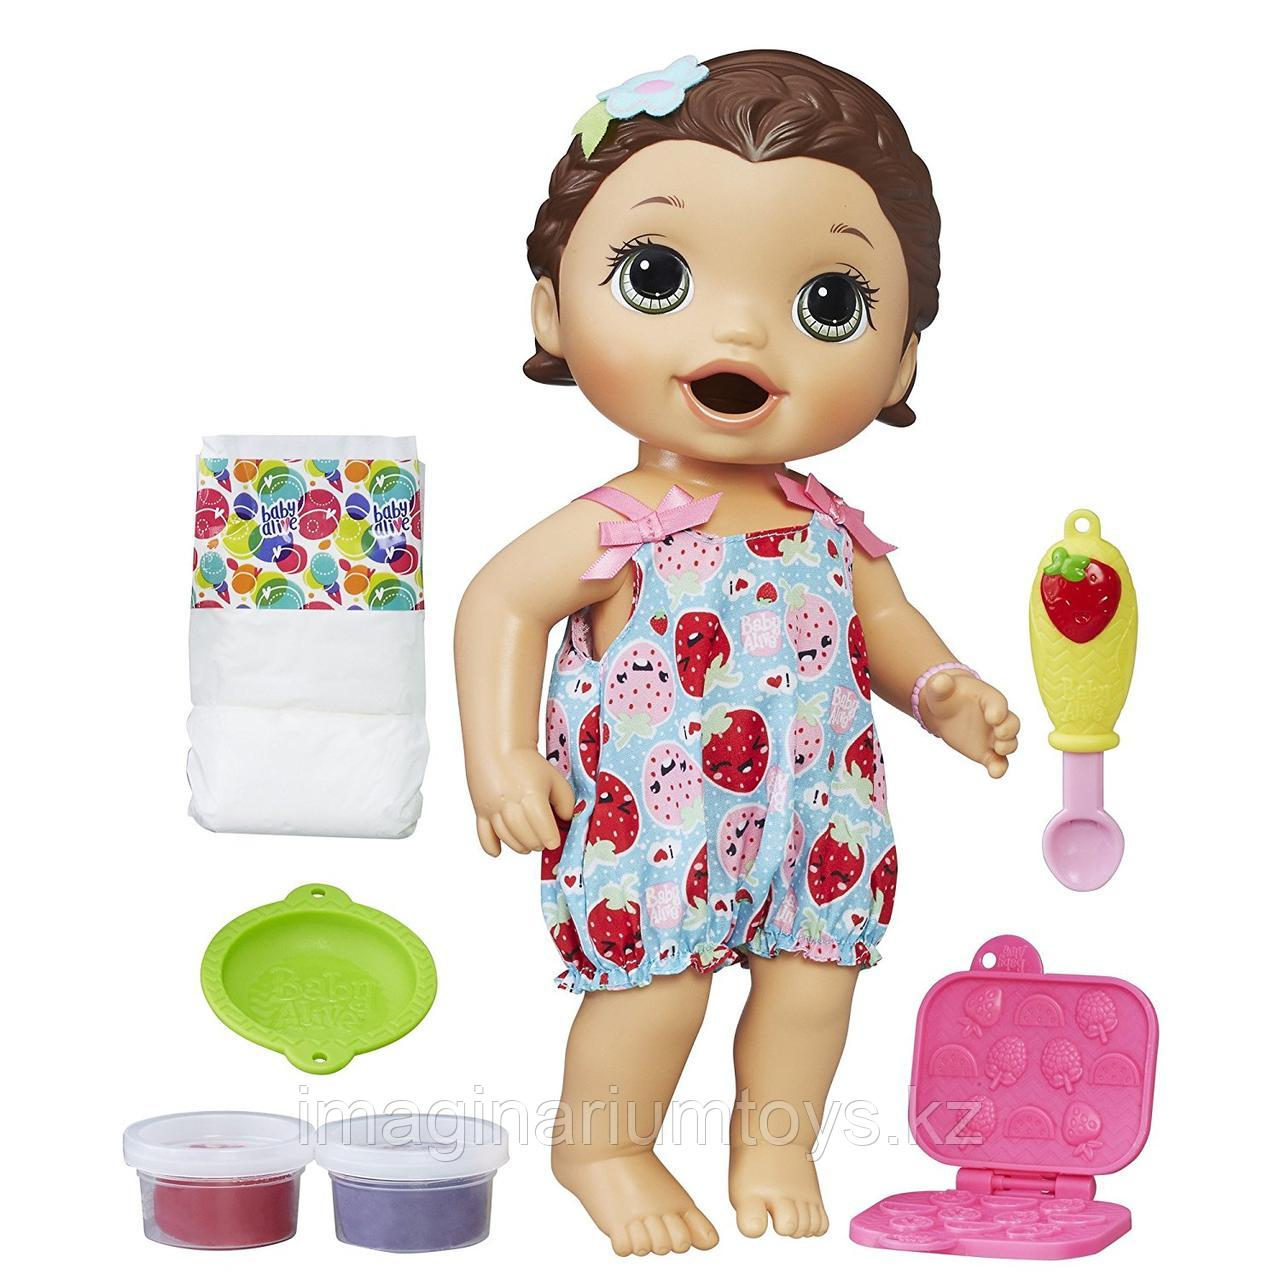 Интерактивная кукла Baby Alive брюнетка